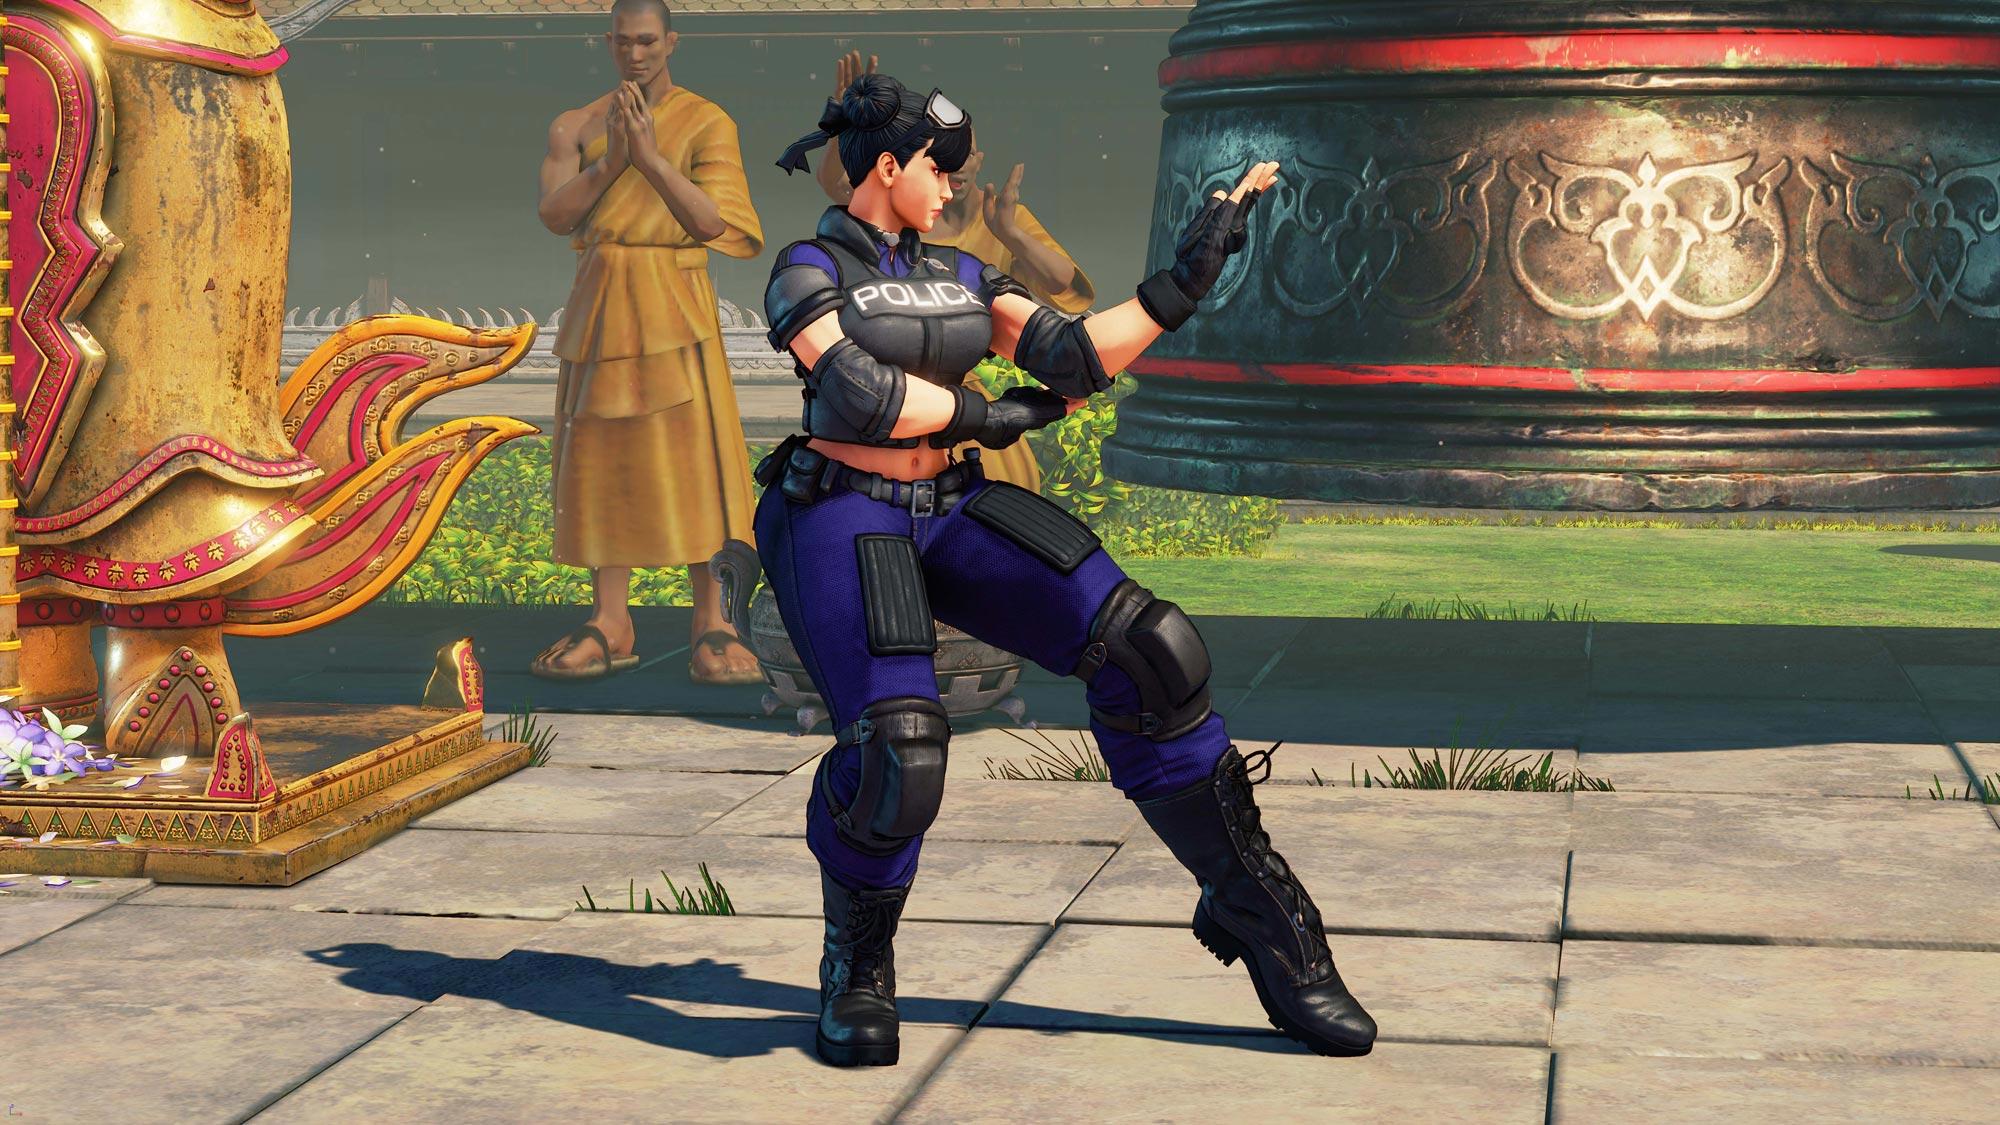 Chun-Li's Street Fighter 5 wardrobe 12 out of 13 image gallery